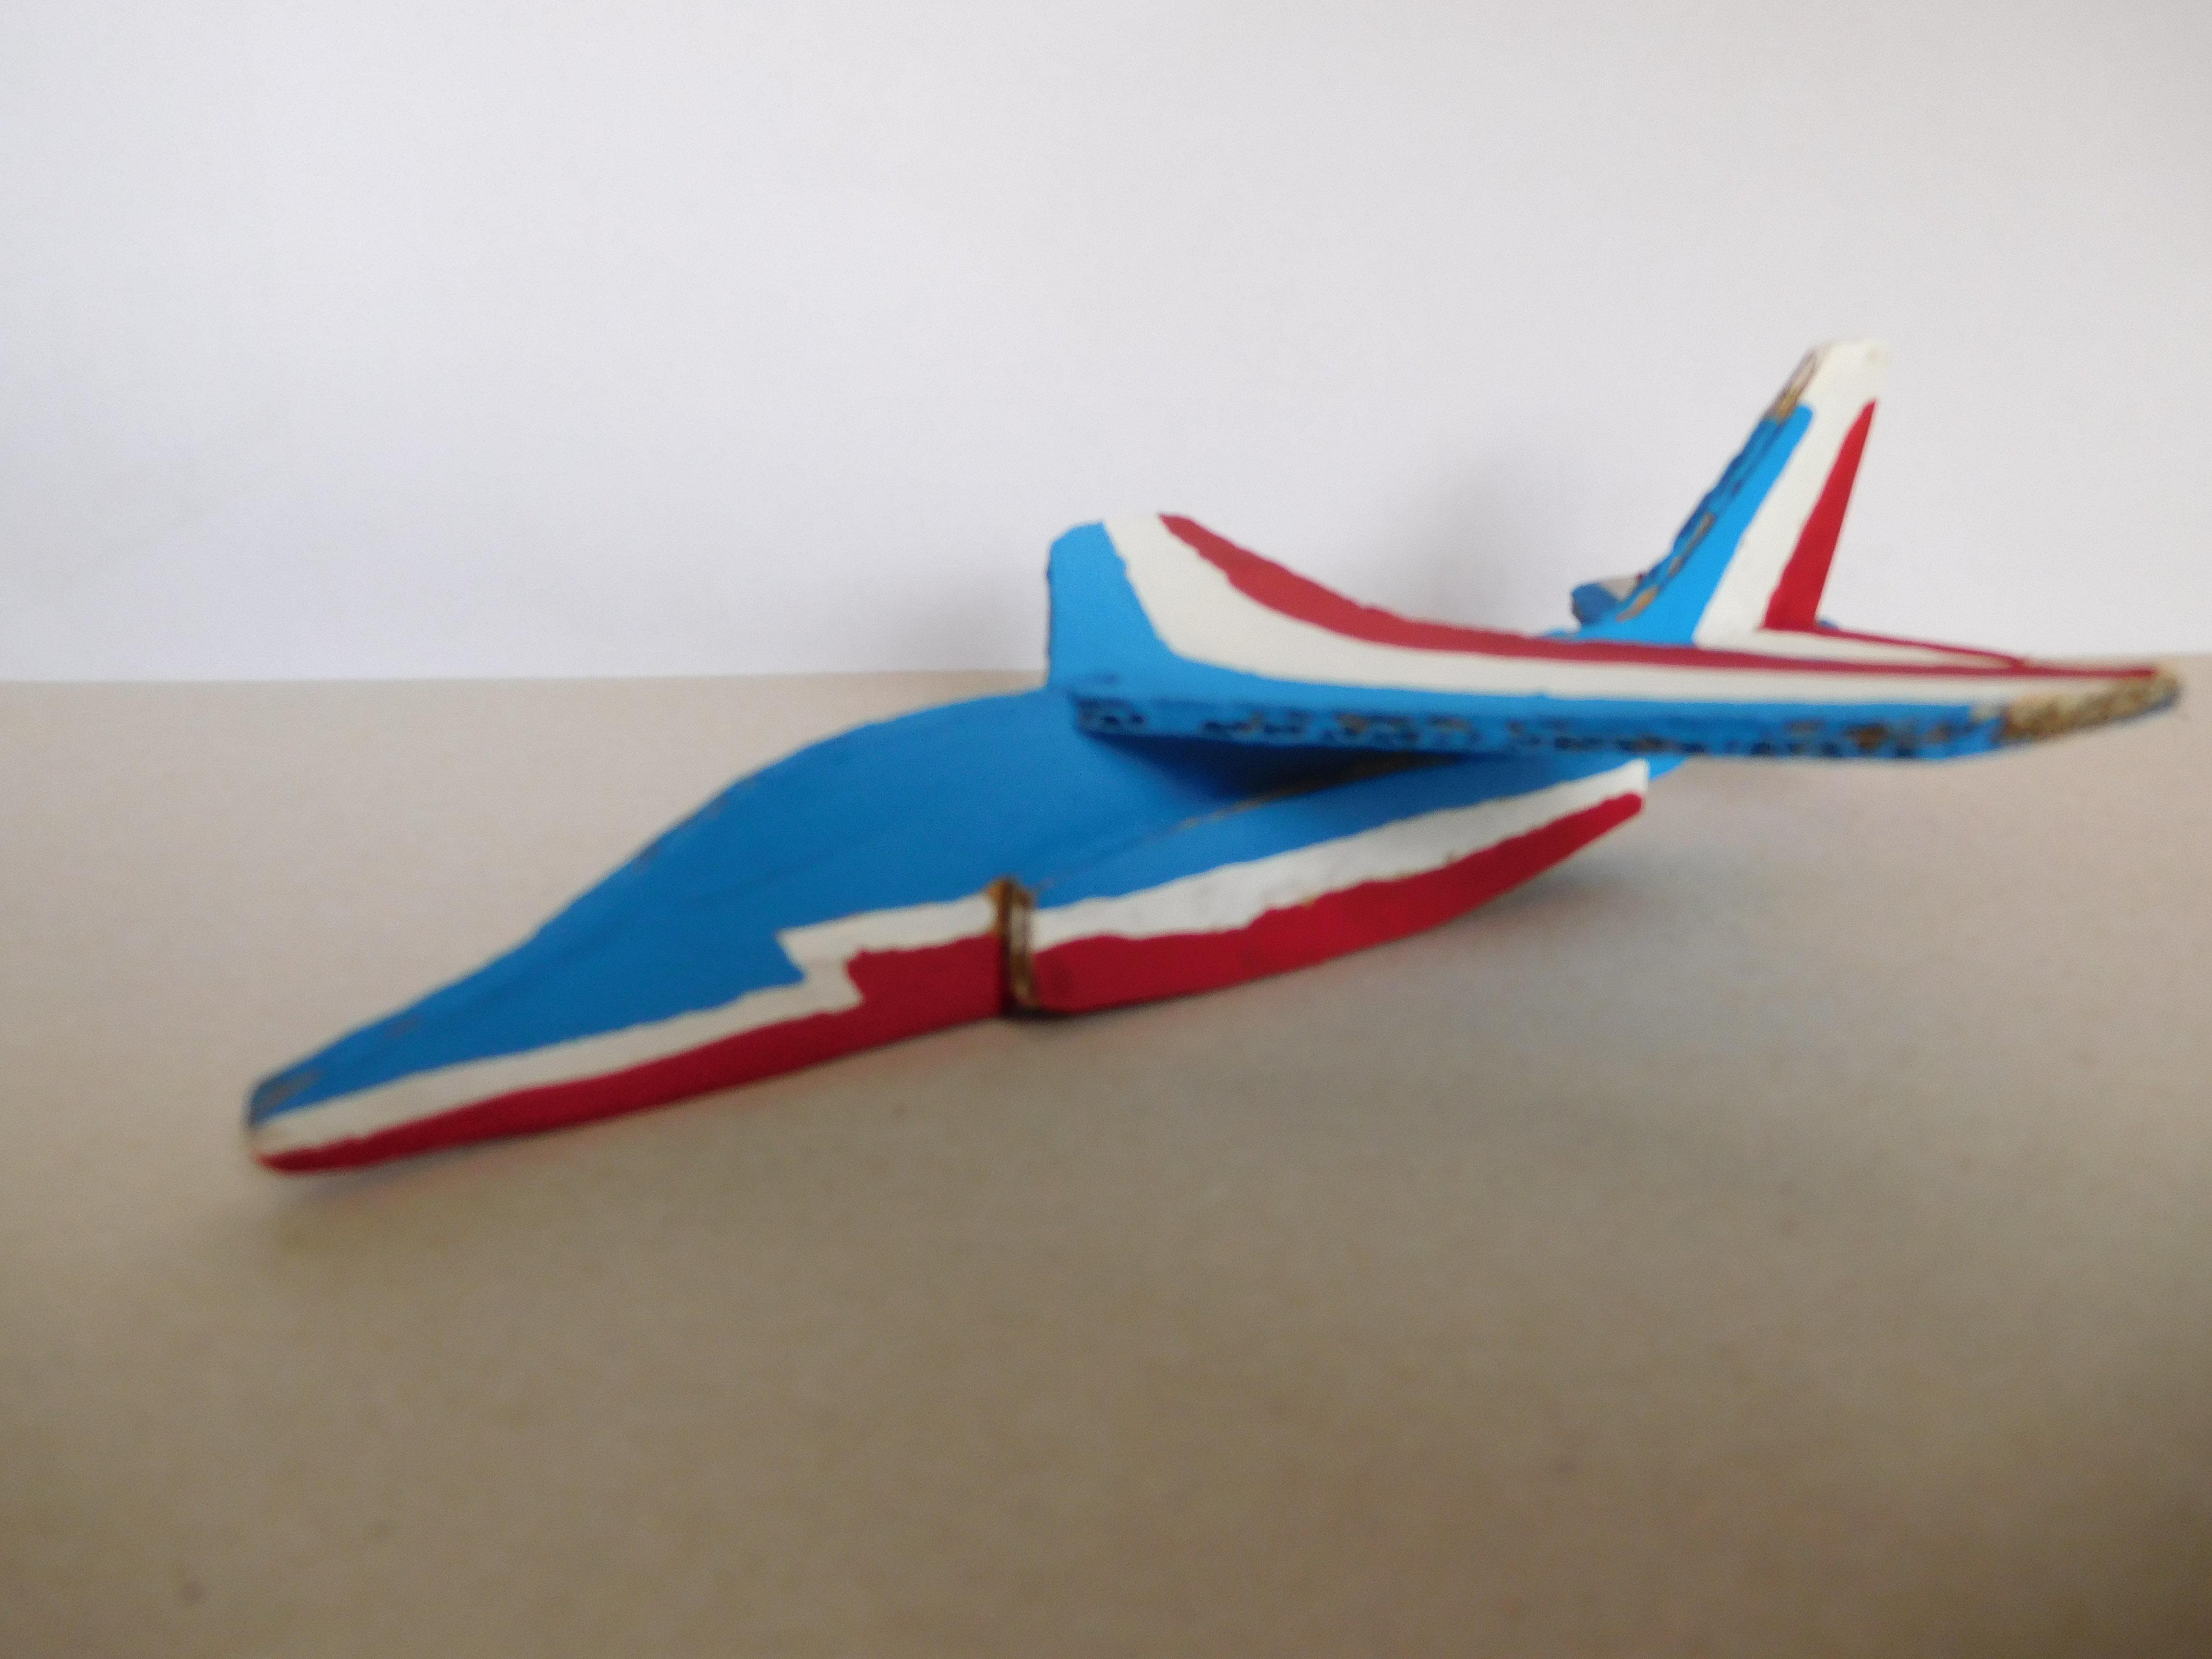 Fabriquer Un Alphajet En Carton | Oui Are Makers concernant Avion De Oui Oui